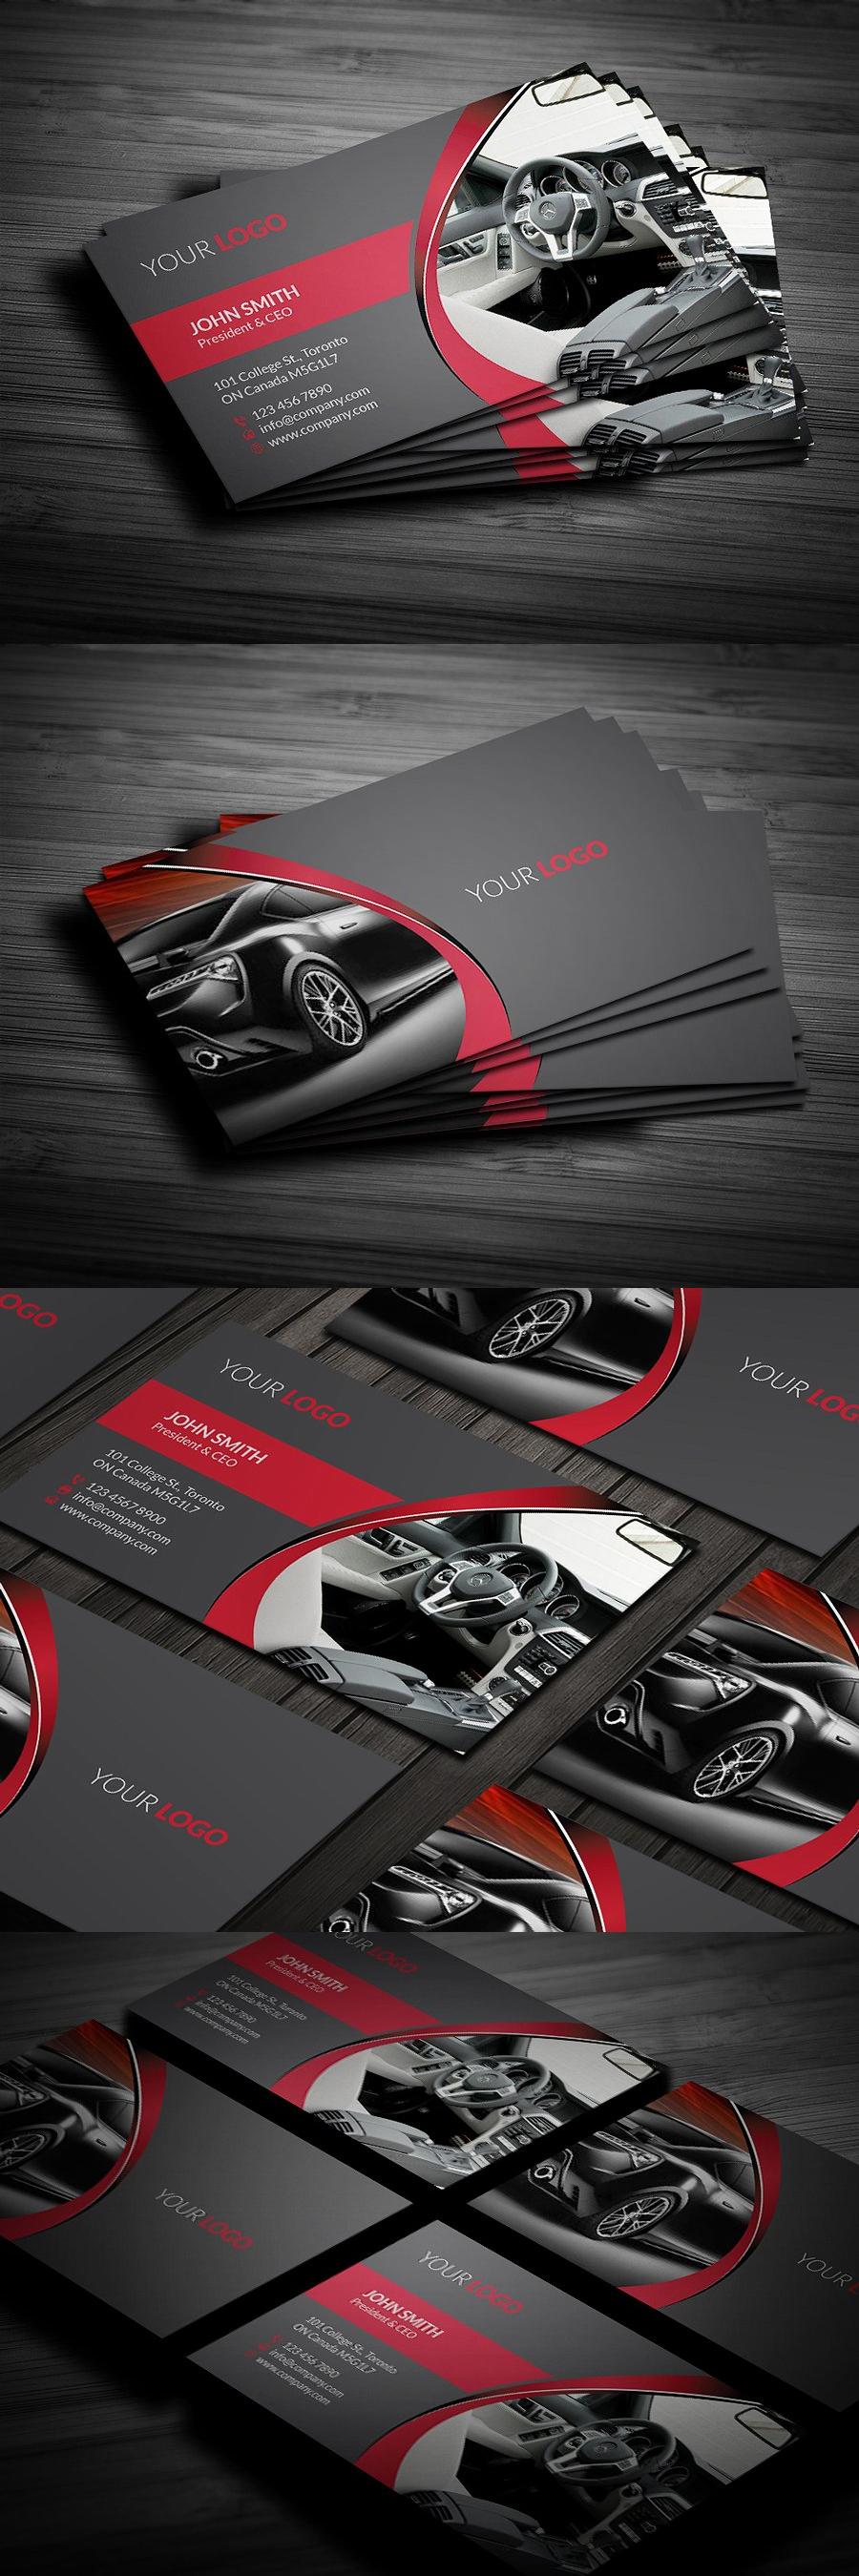 Rent a car business card pinterest card templates business rent a car business card template psd reheart Gallery